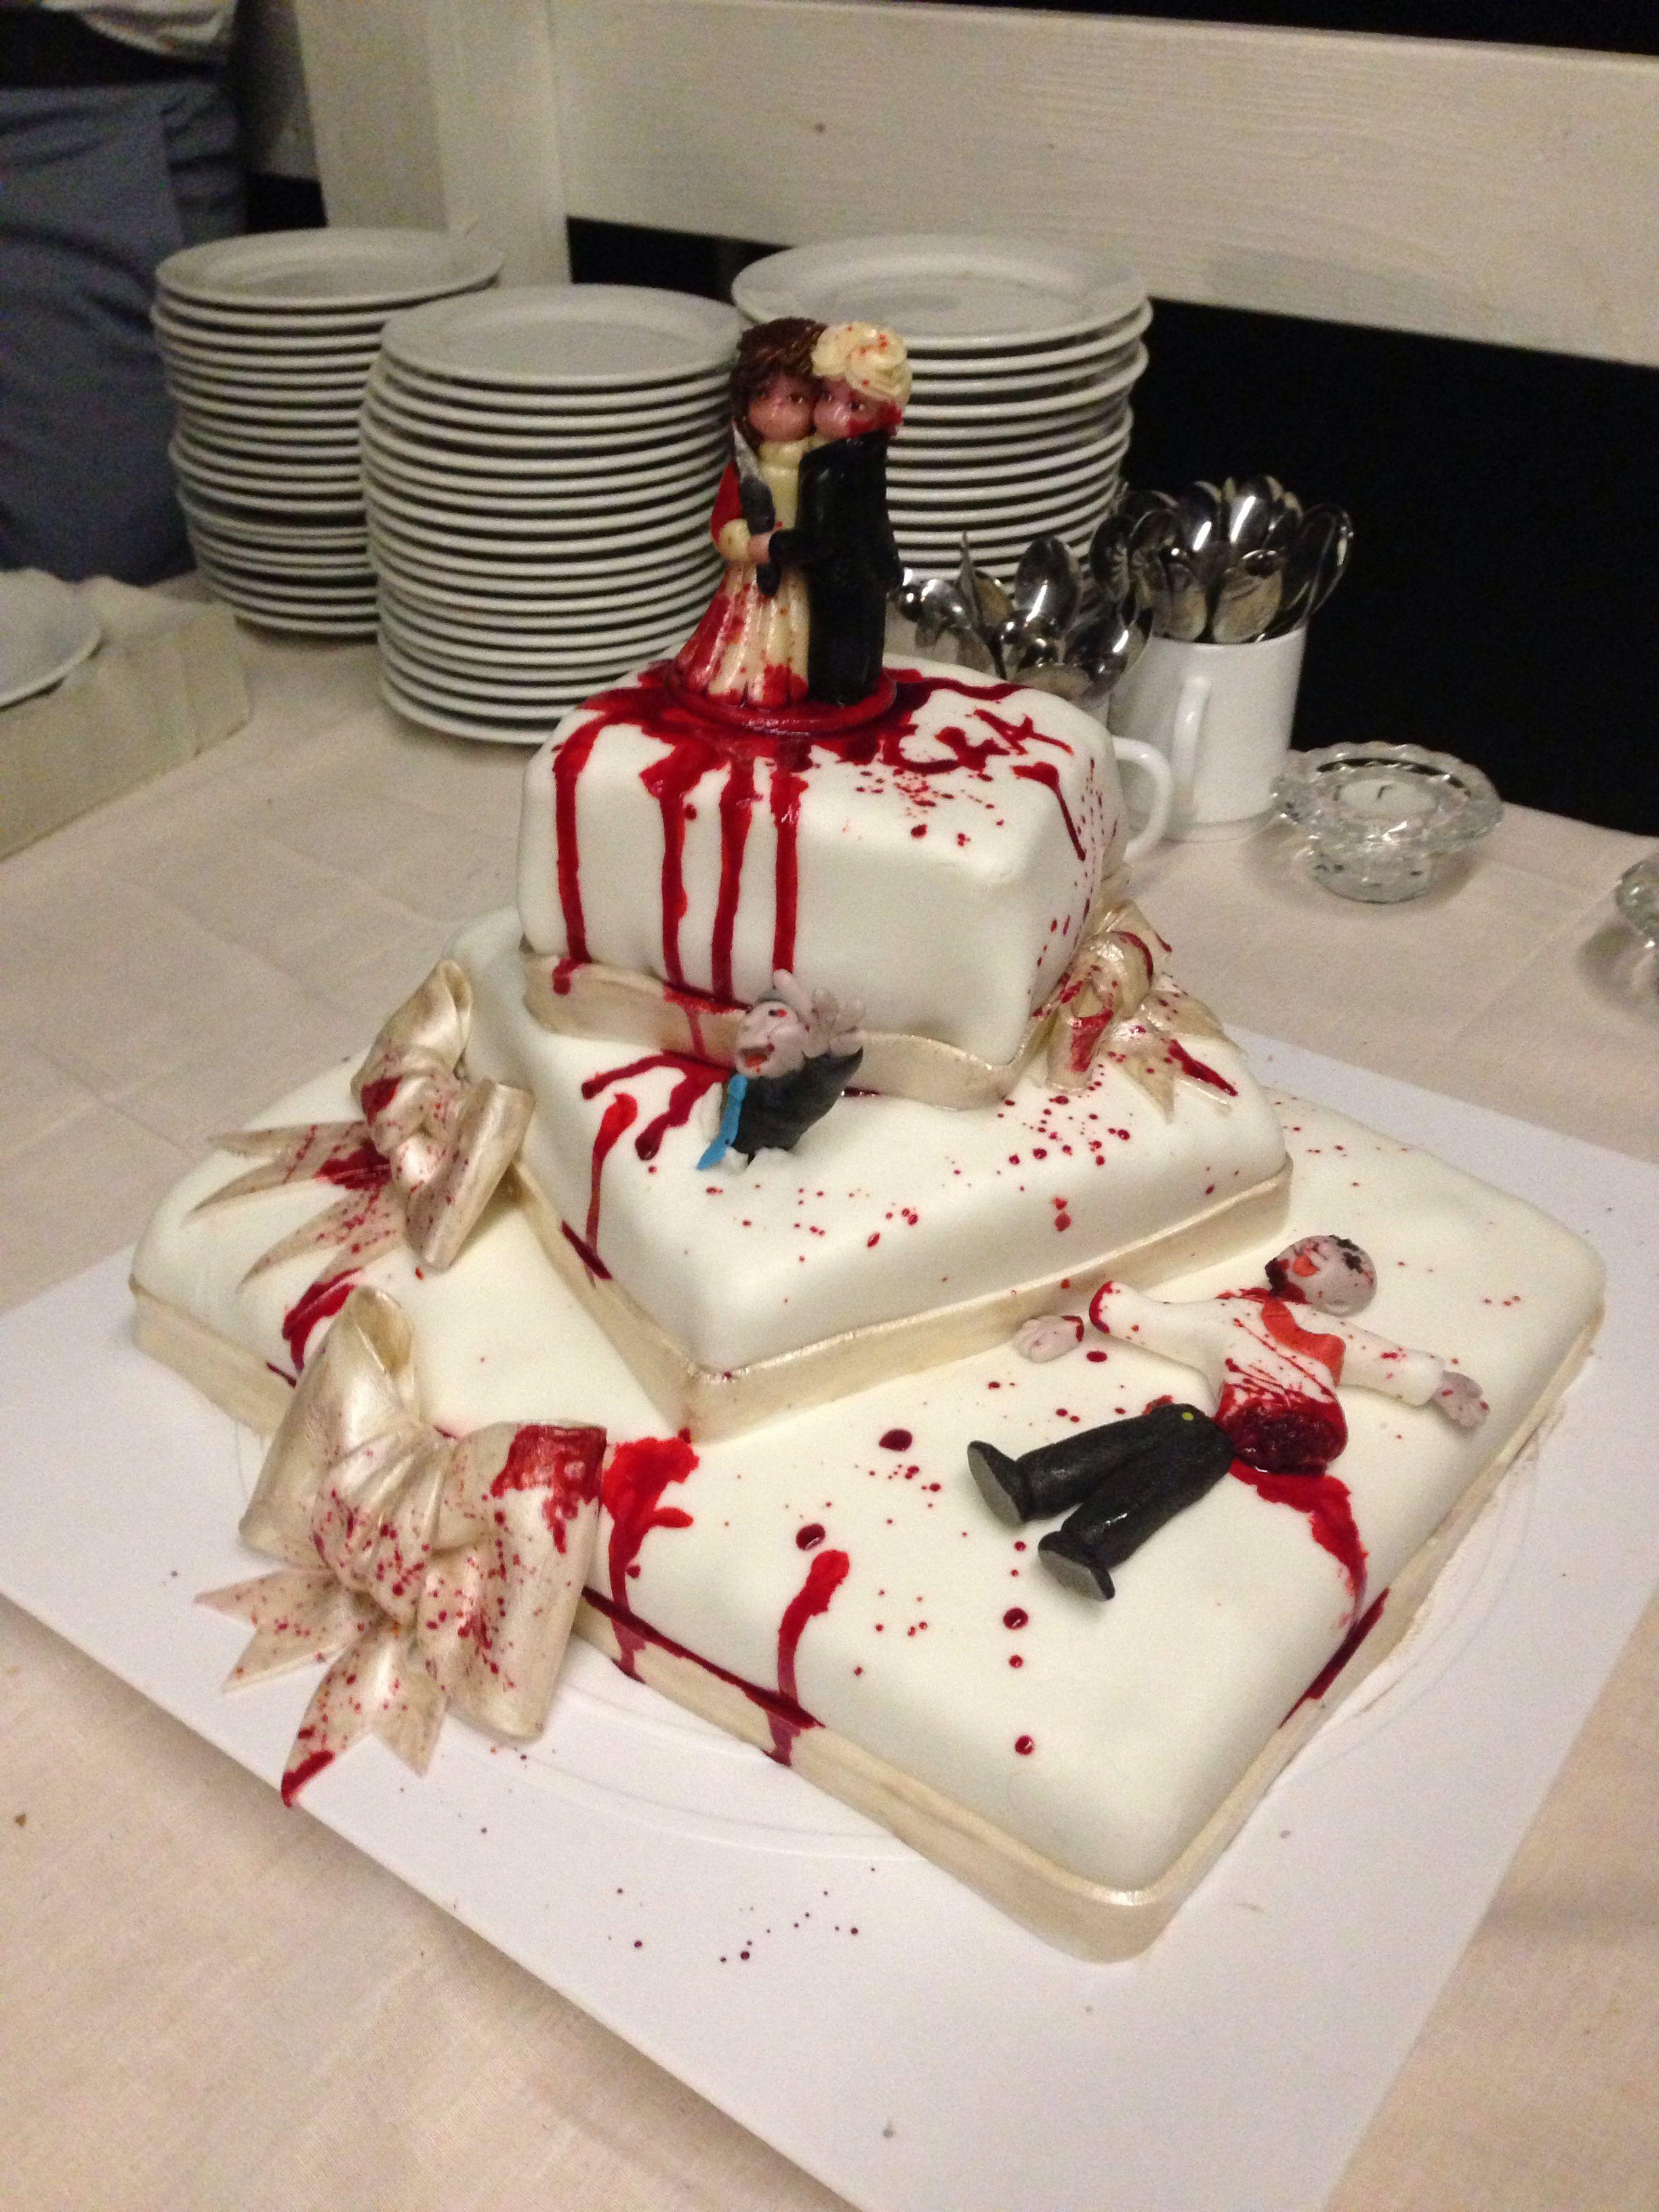 Zombie Wedding Cake That S Clever Zombie Wedding Cakes Zombie